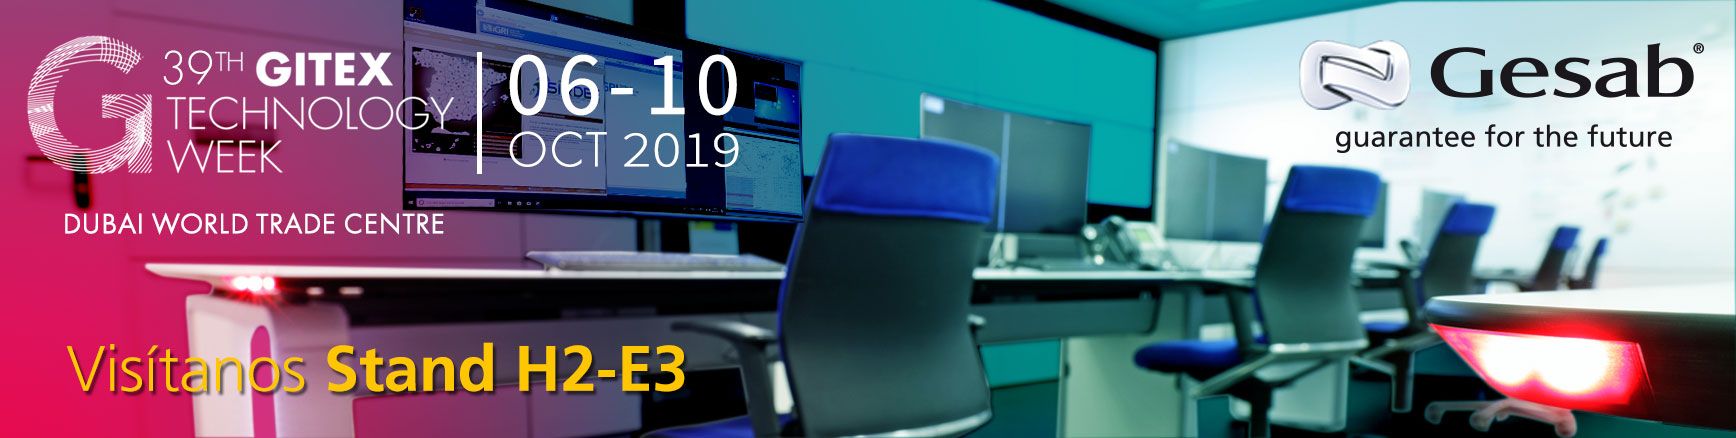 39th Gitex Technology Week